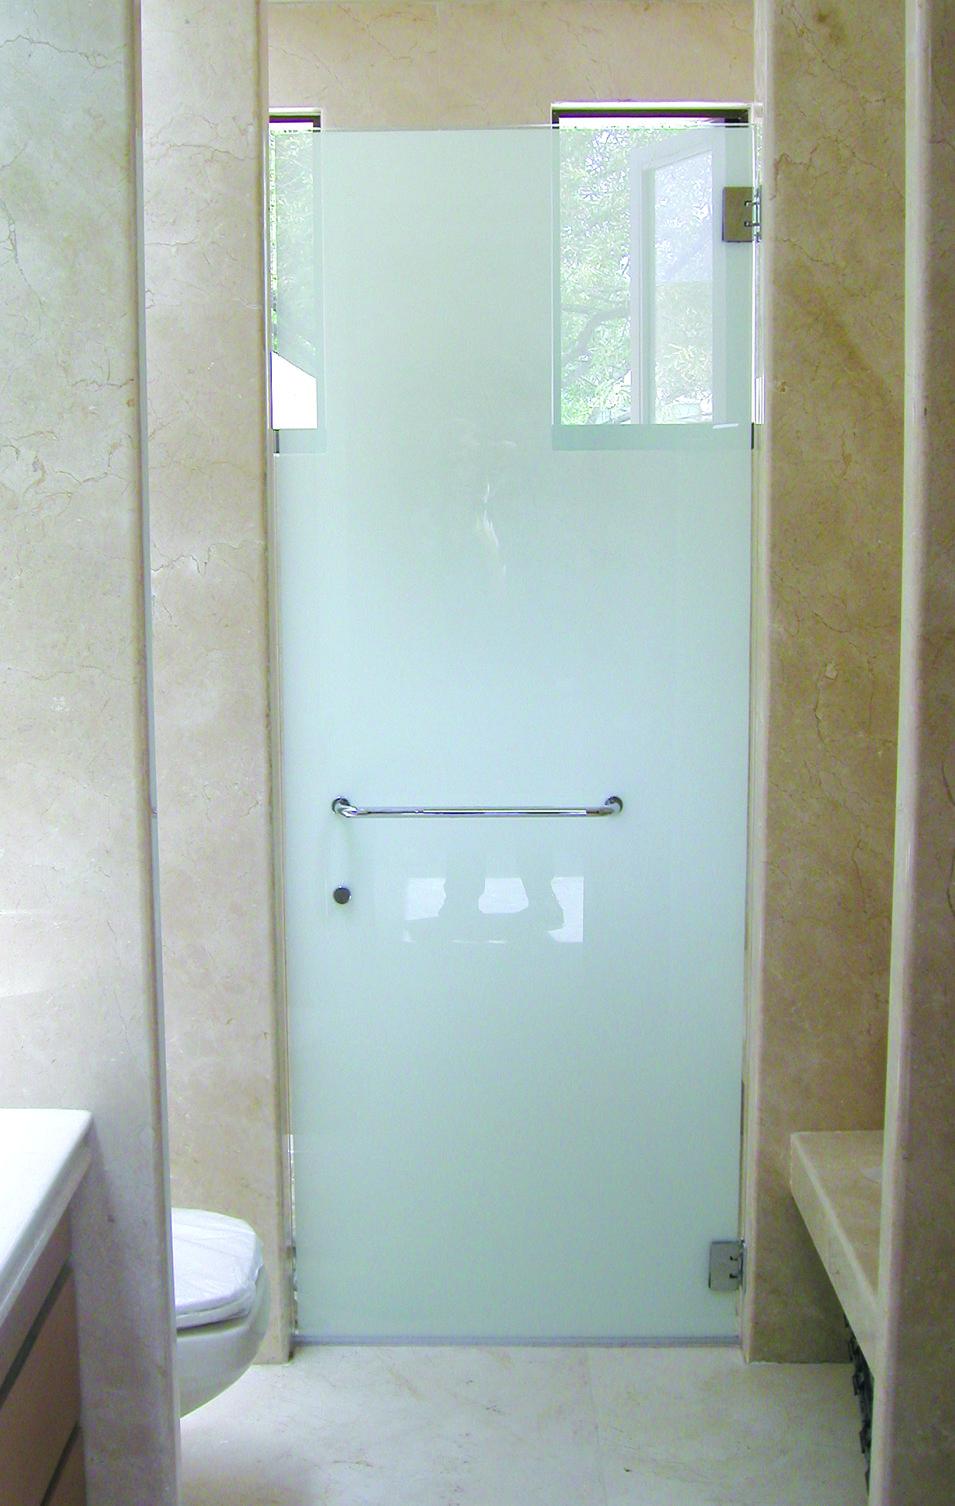 Austin shower door contractor offers sales and installations of ...